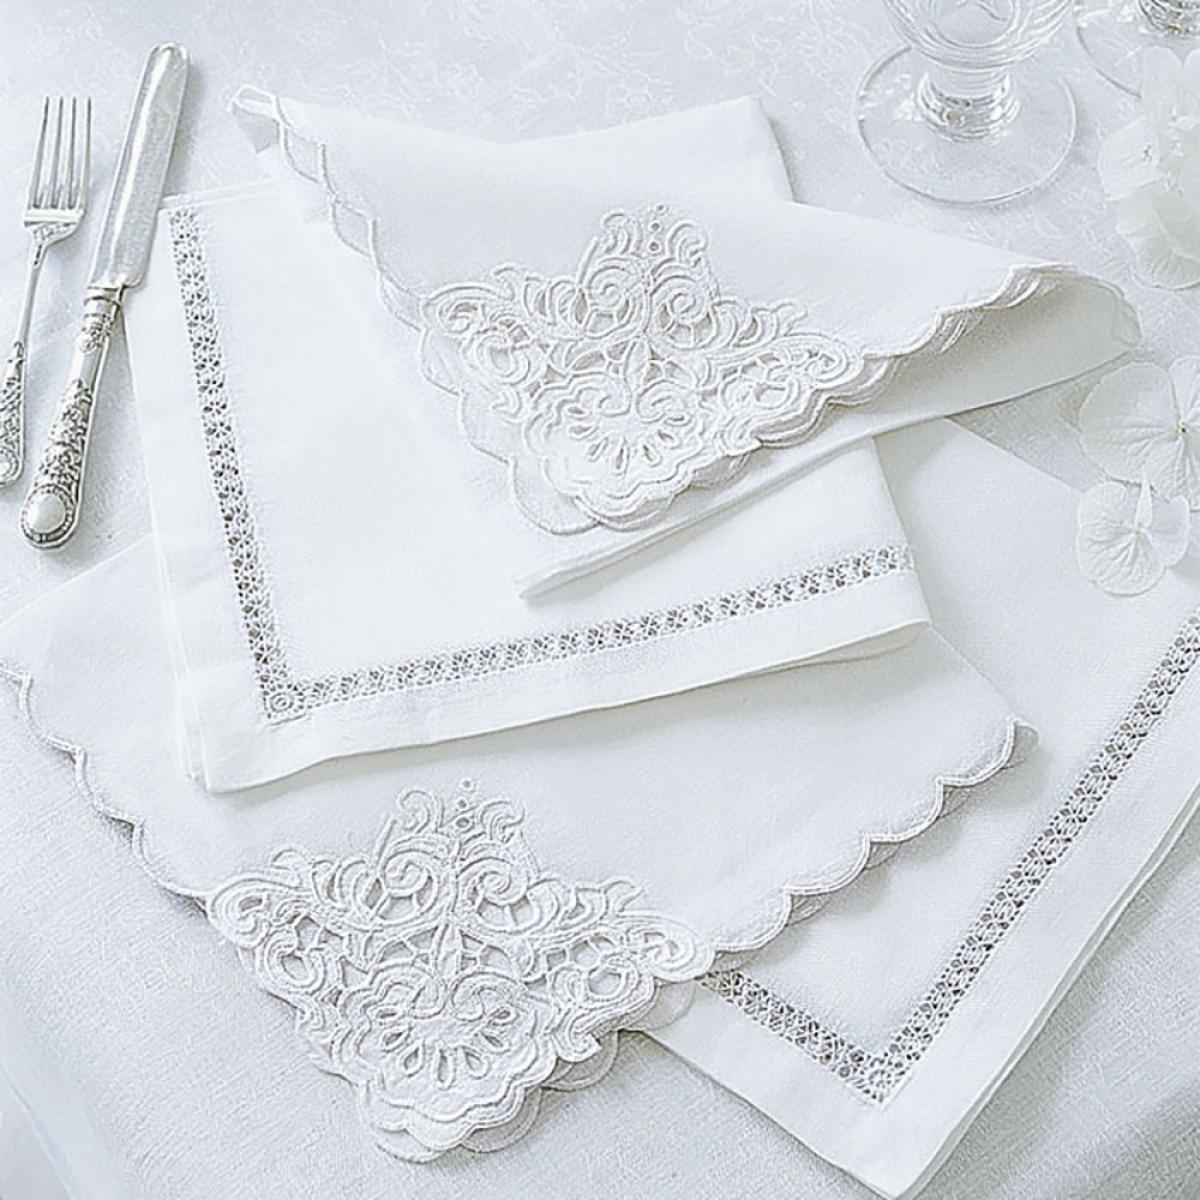 Linen Cotton Mix Embroidered Napkins